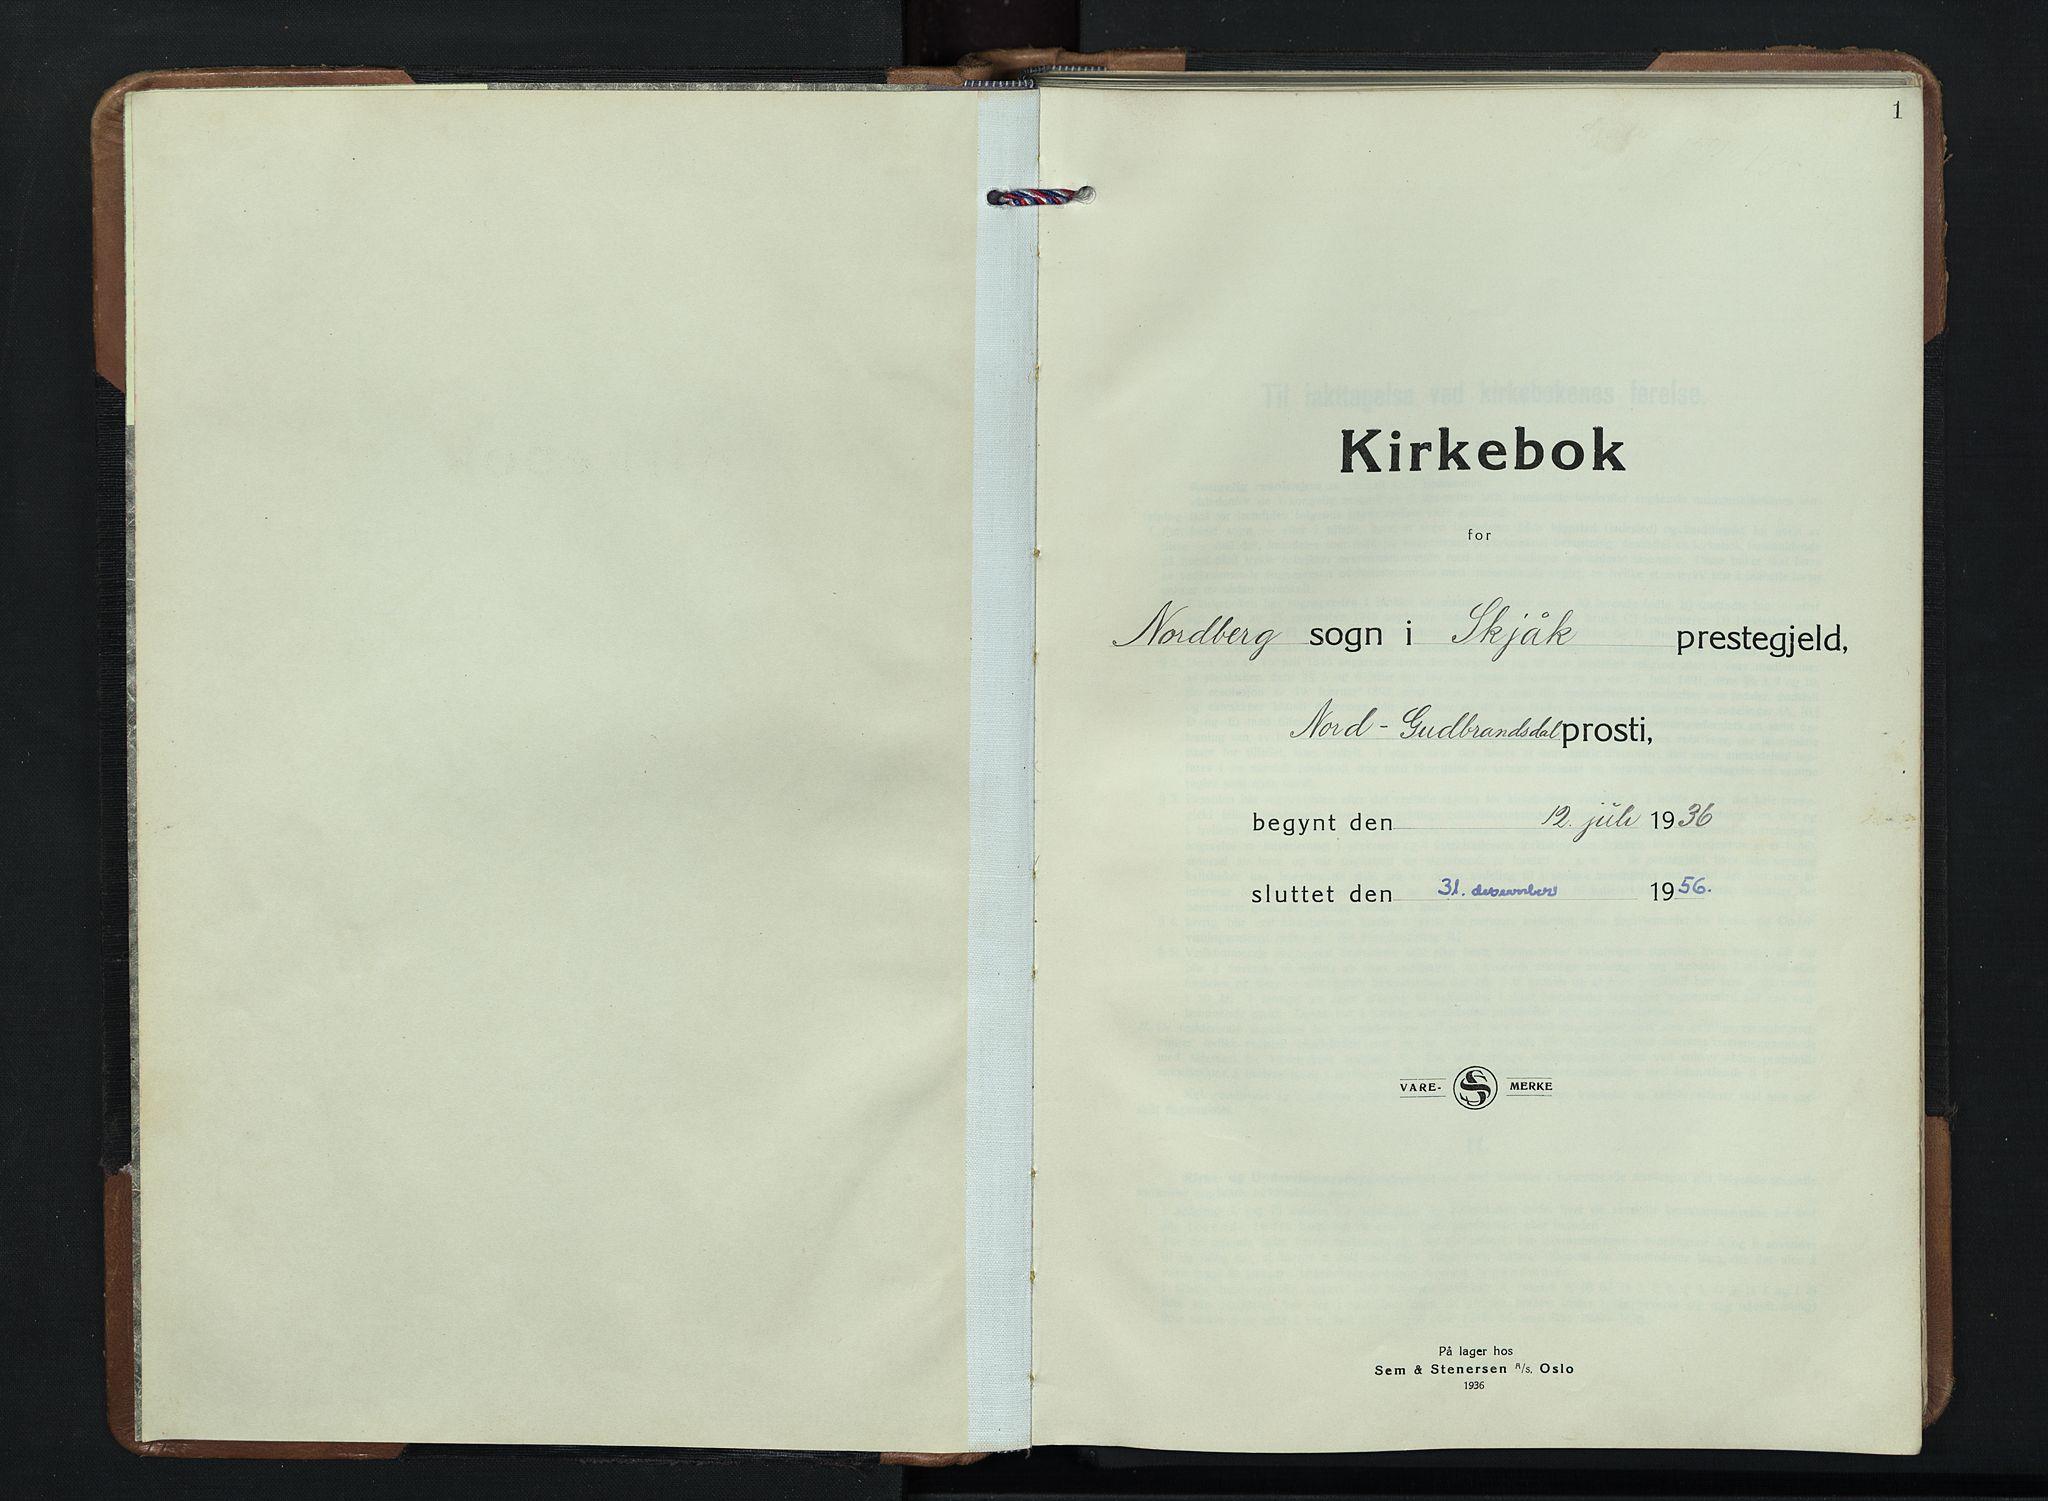 SAH, Skjåk prestekontor, Klokkerbok nr. 7, 1936-1958, s. 1